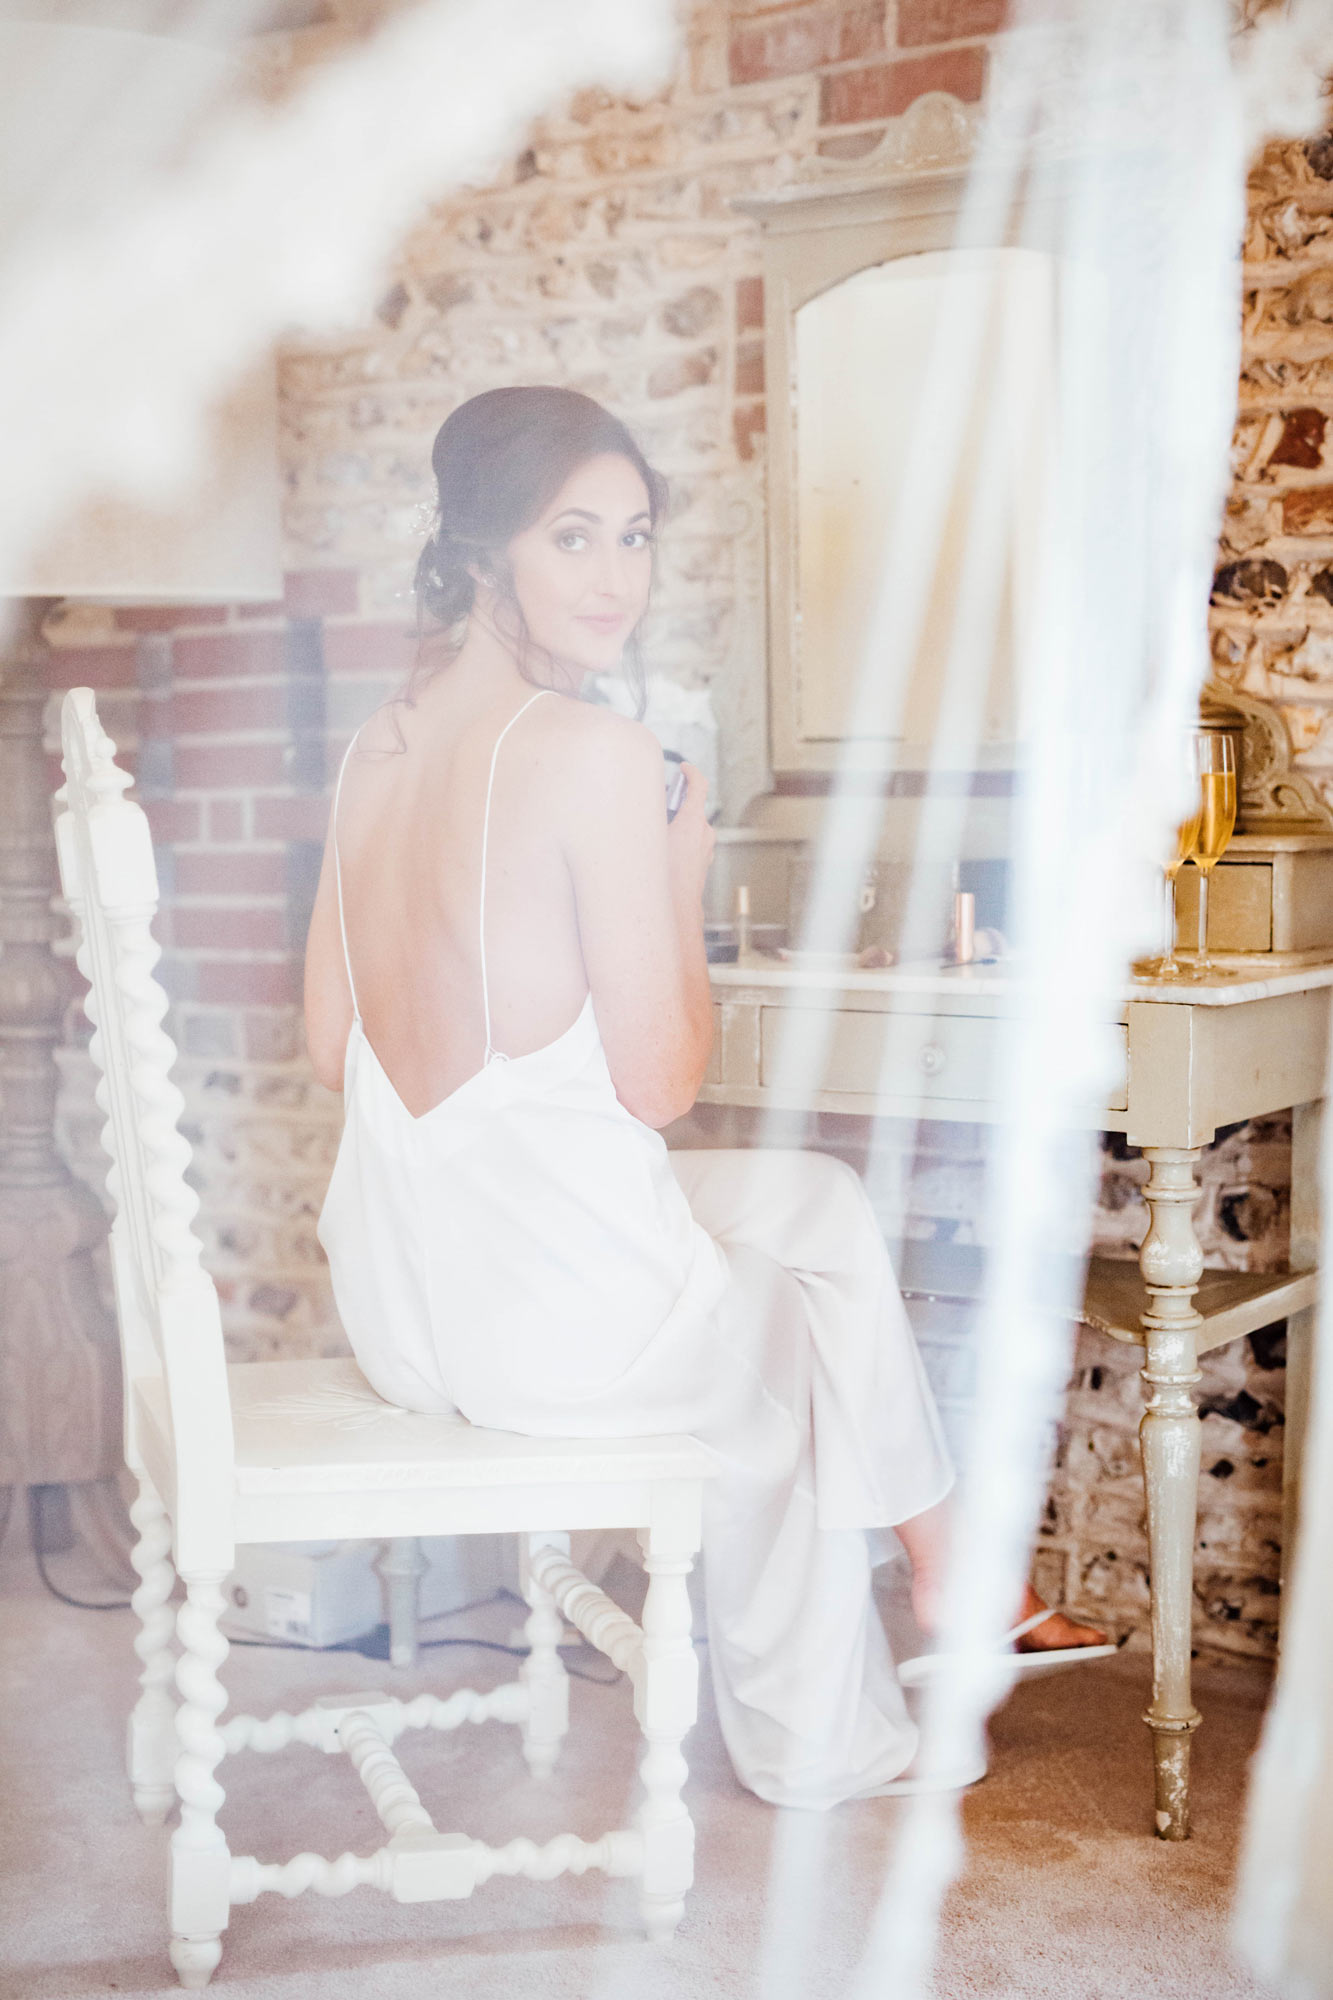 BeckyLee-wedding2.jpg